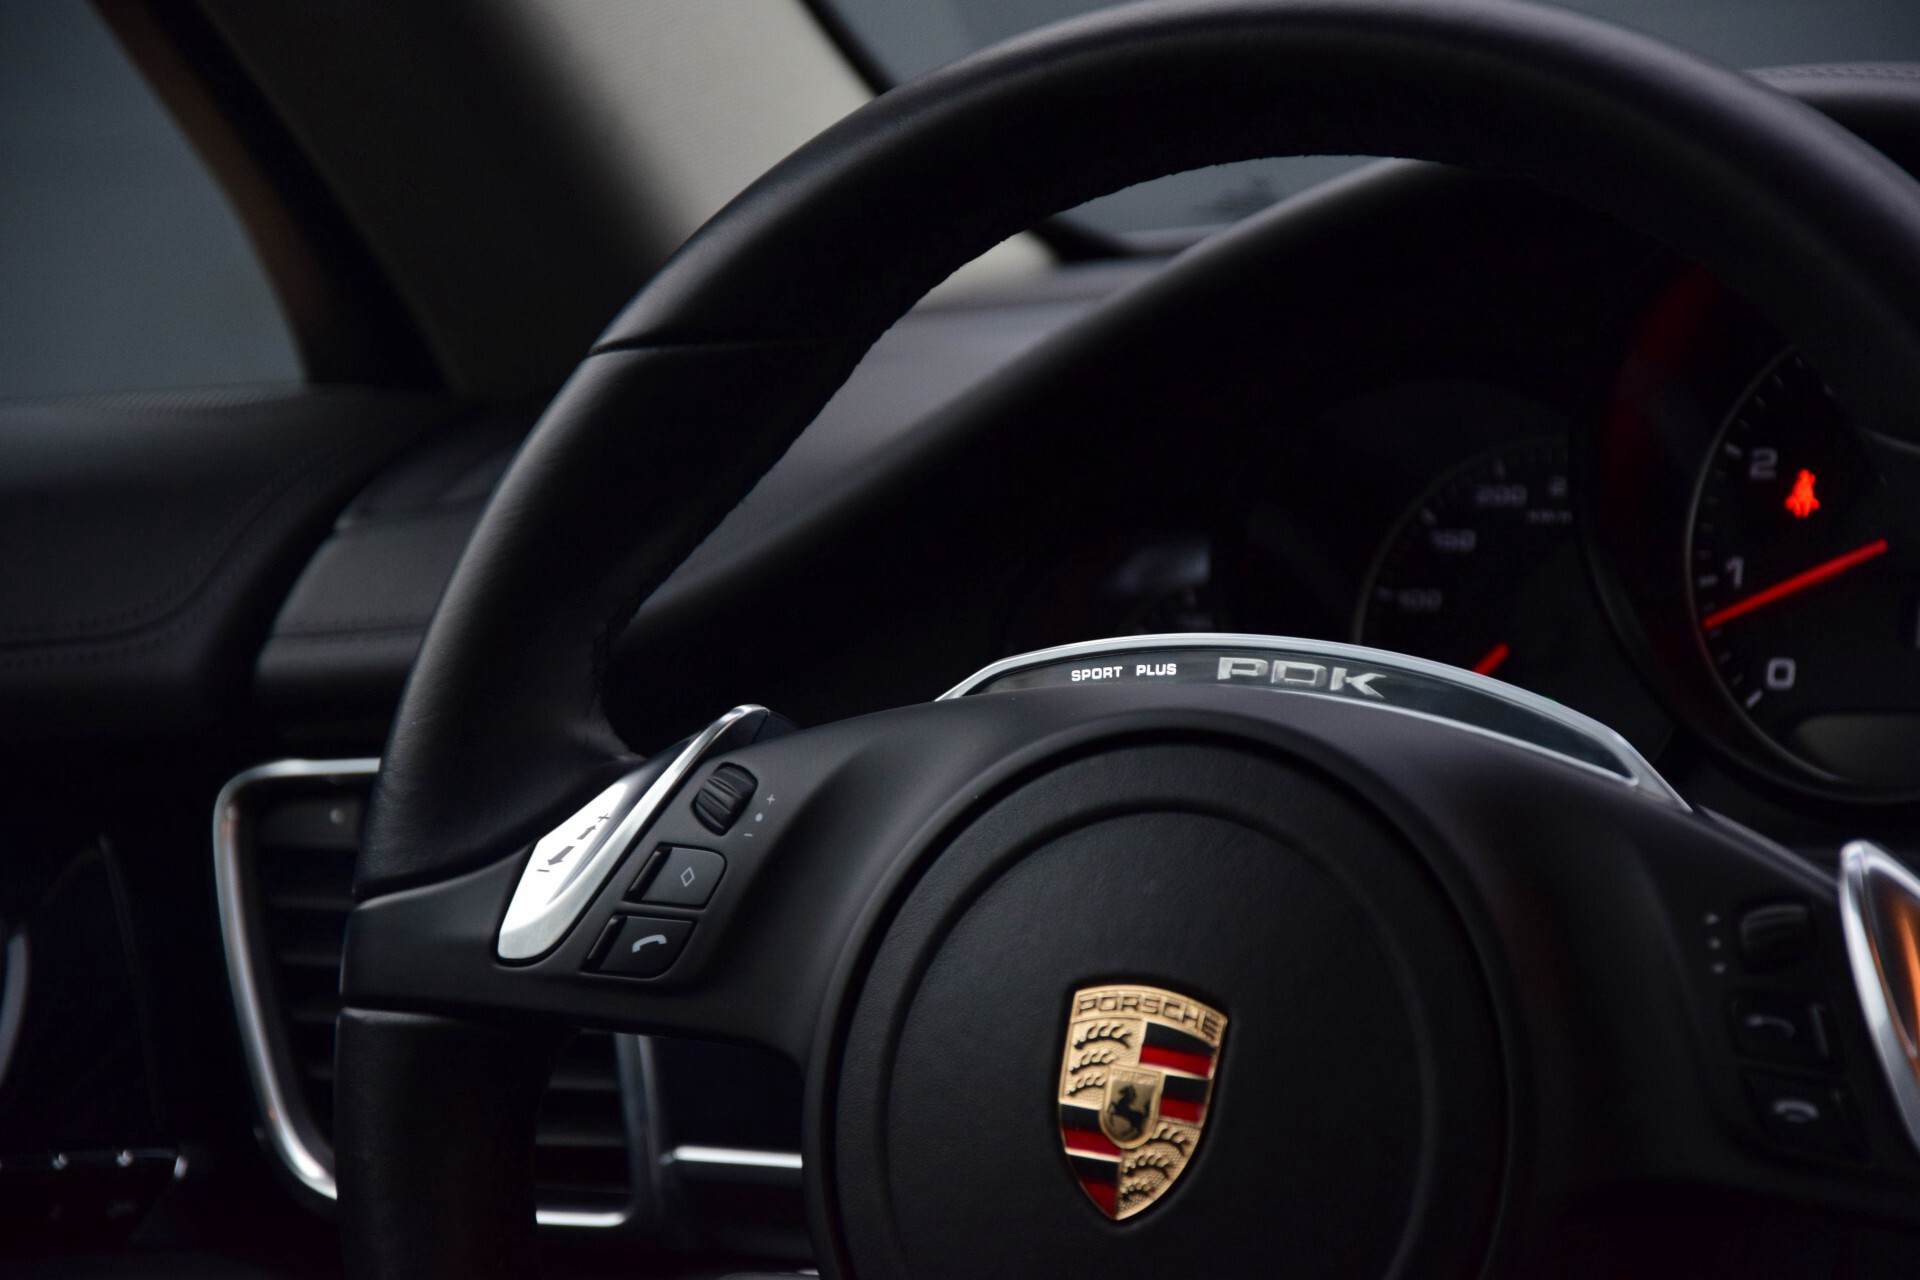 Porsche Panamera 3.6 4 Sportchrono/Luchtvering/Dak/Nappa/Aut7 Foto 37